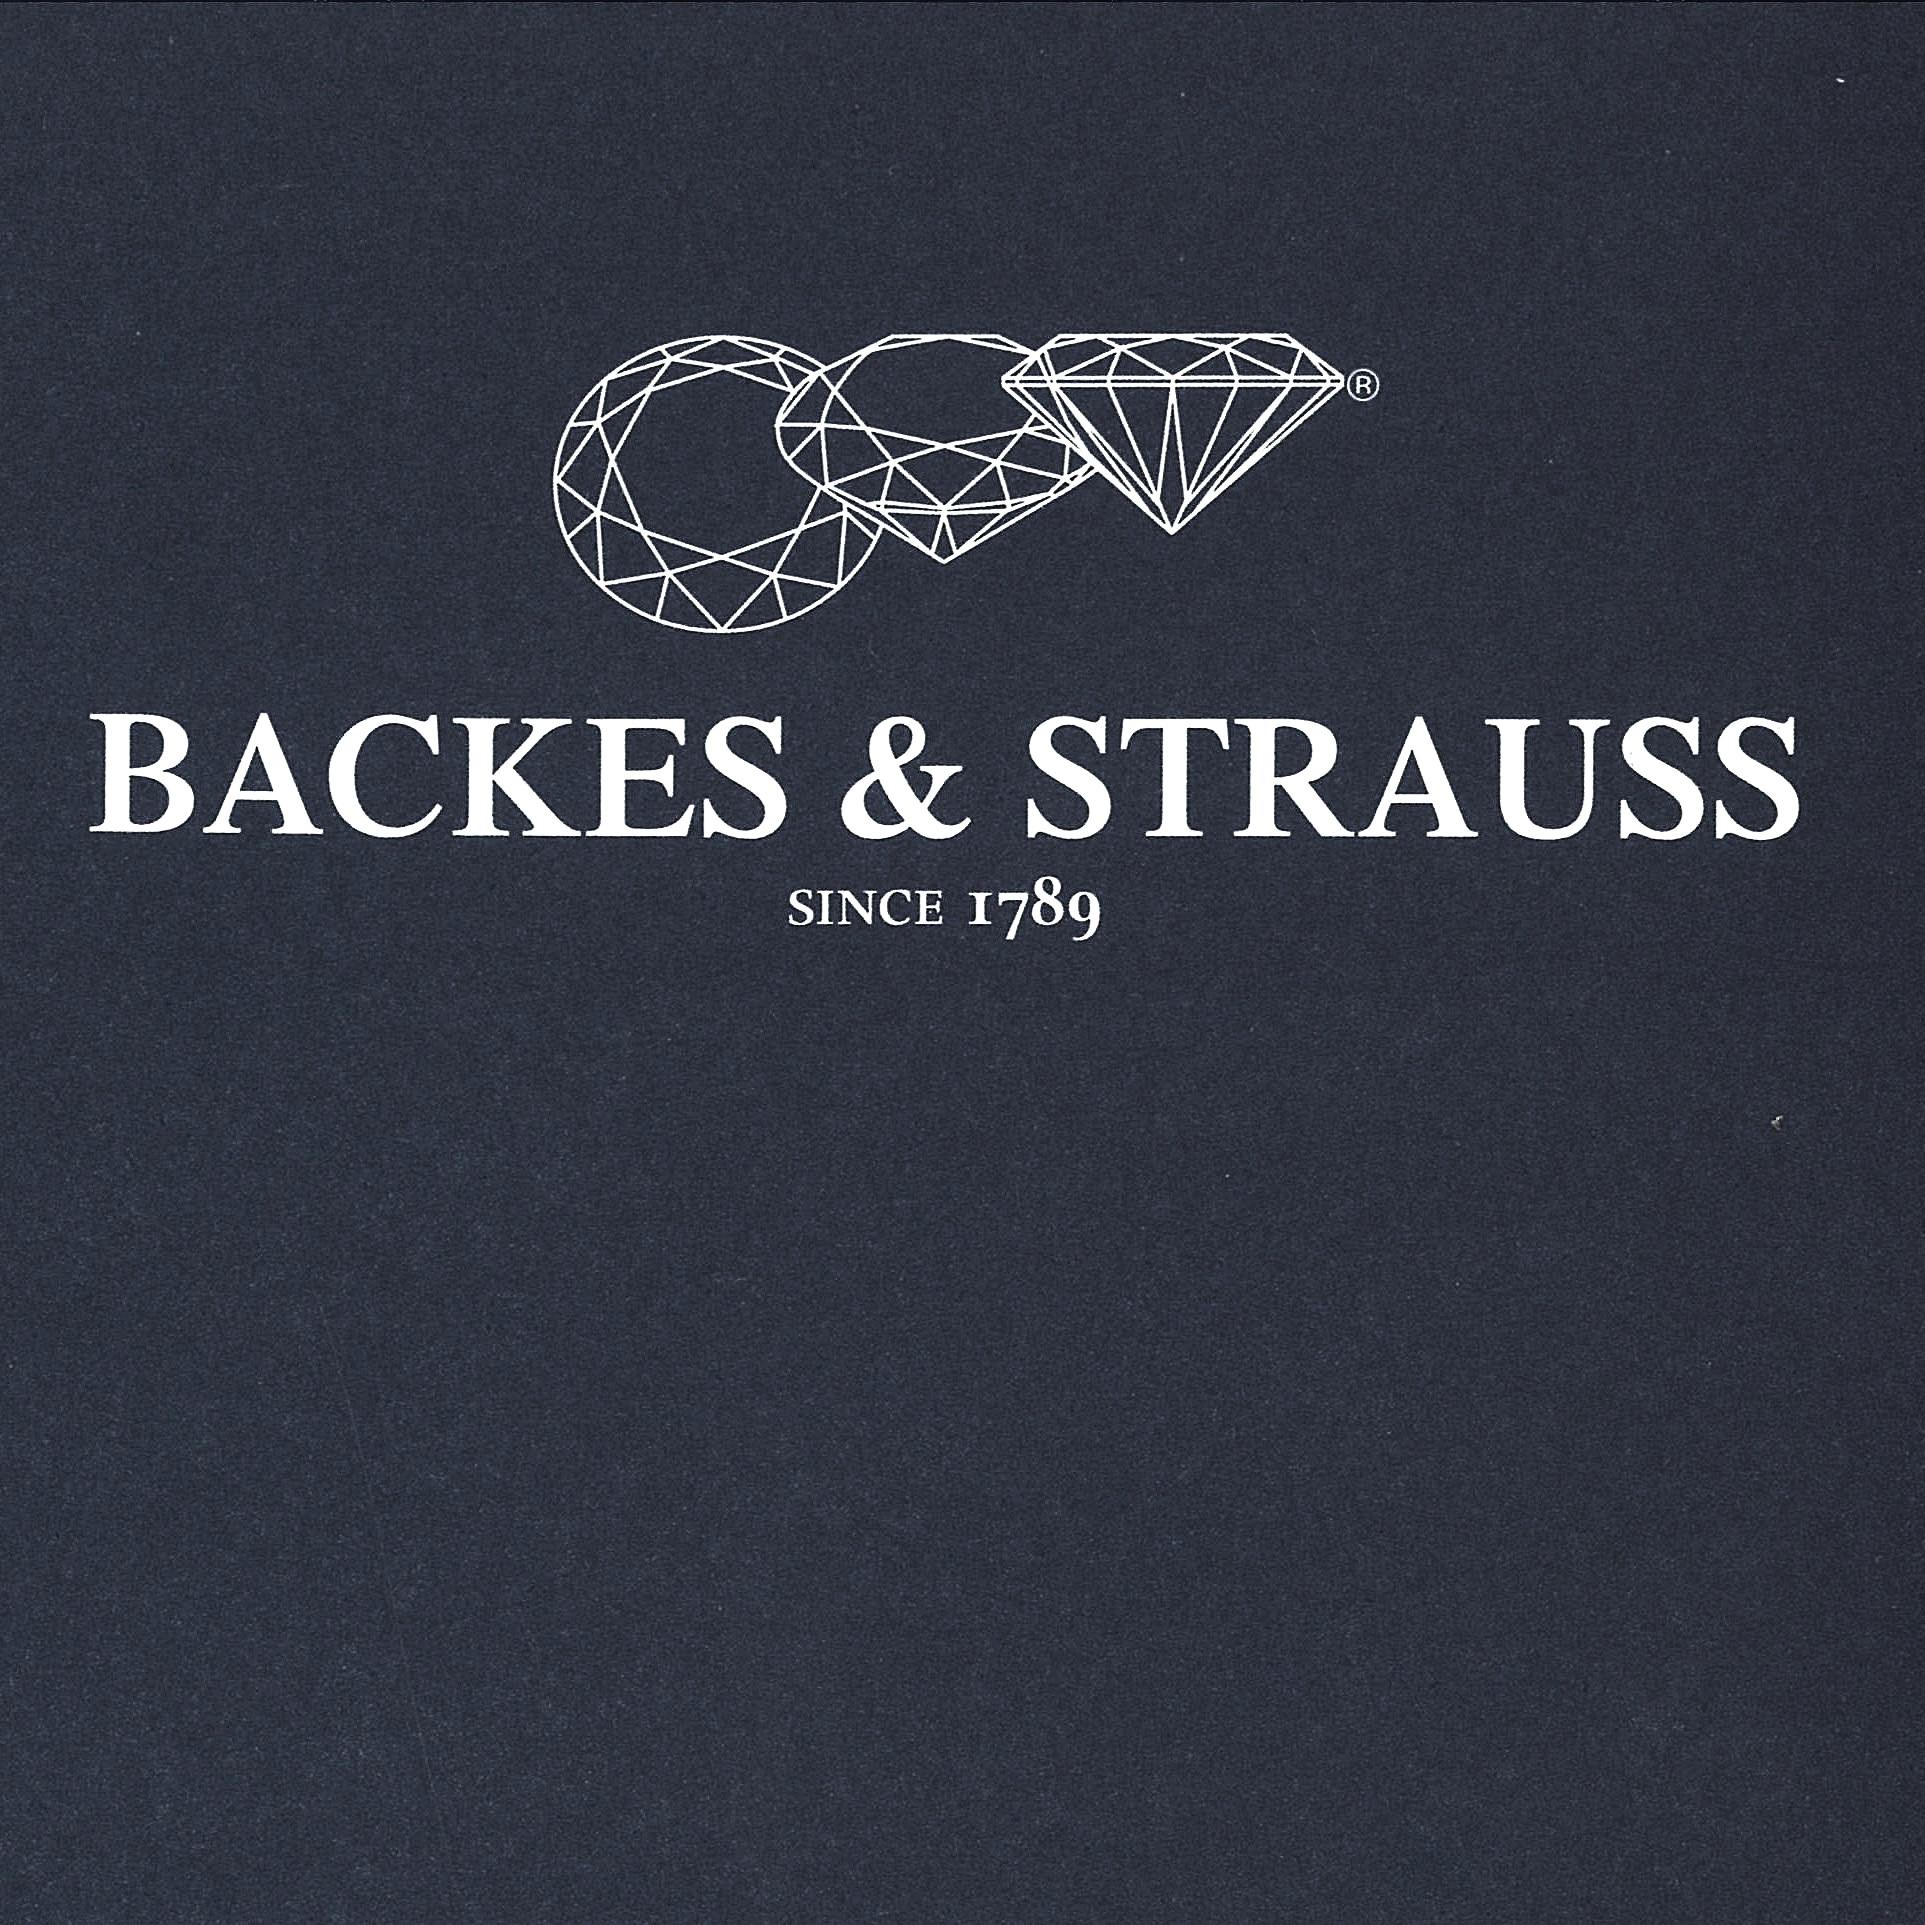 Backes & Strauss diamond manufacturer trademark